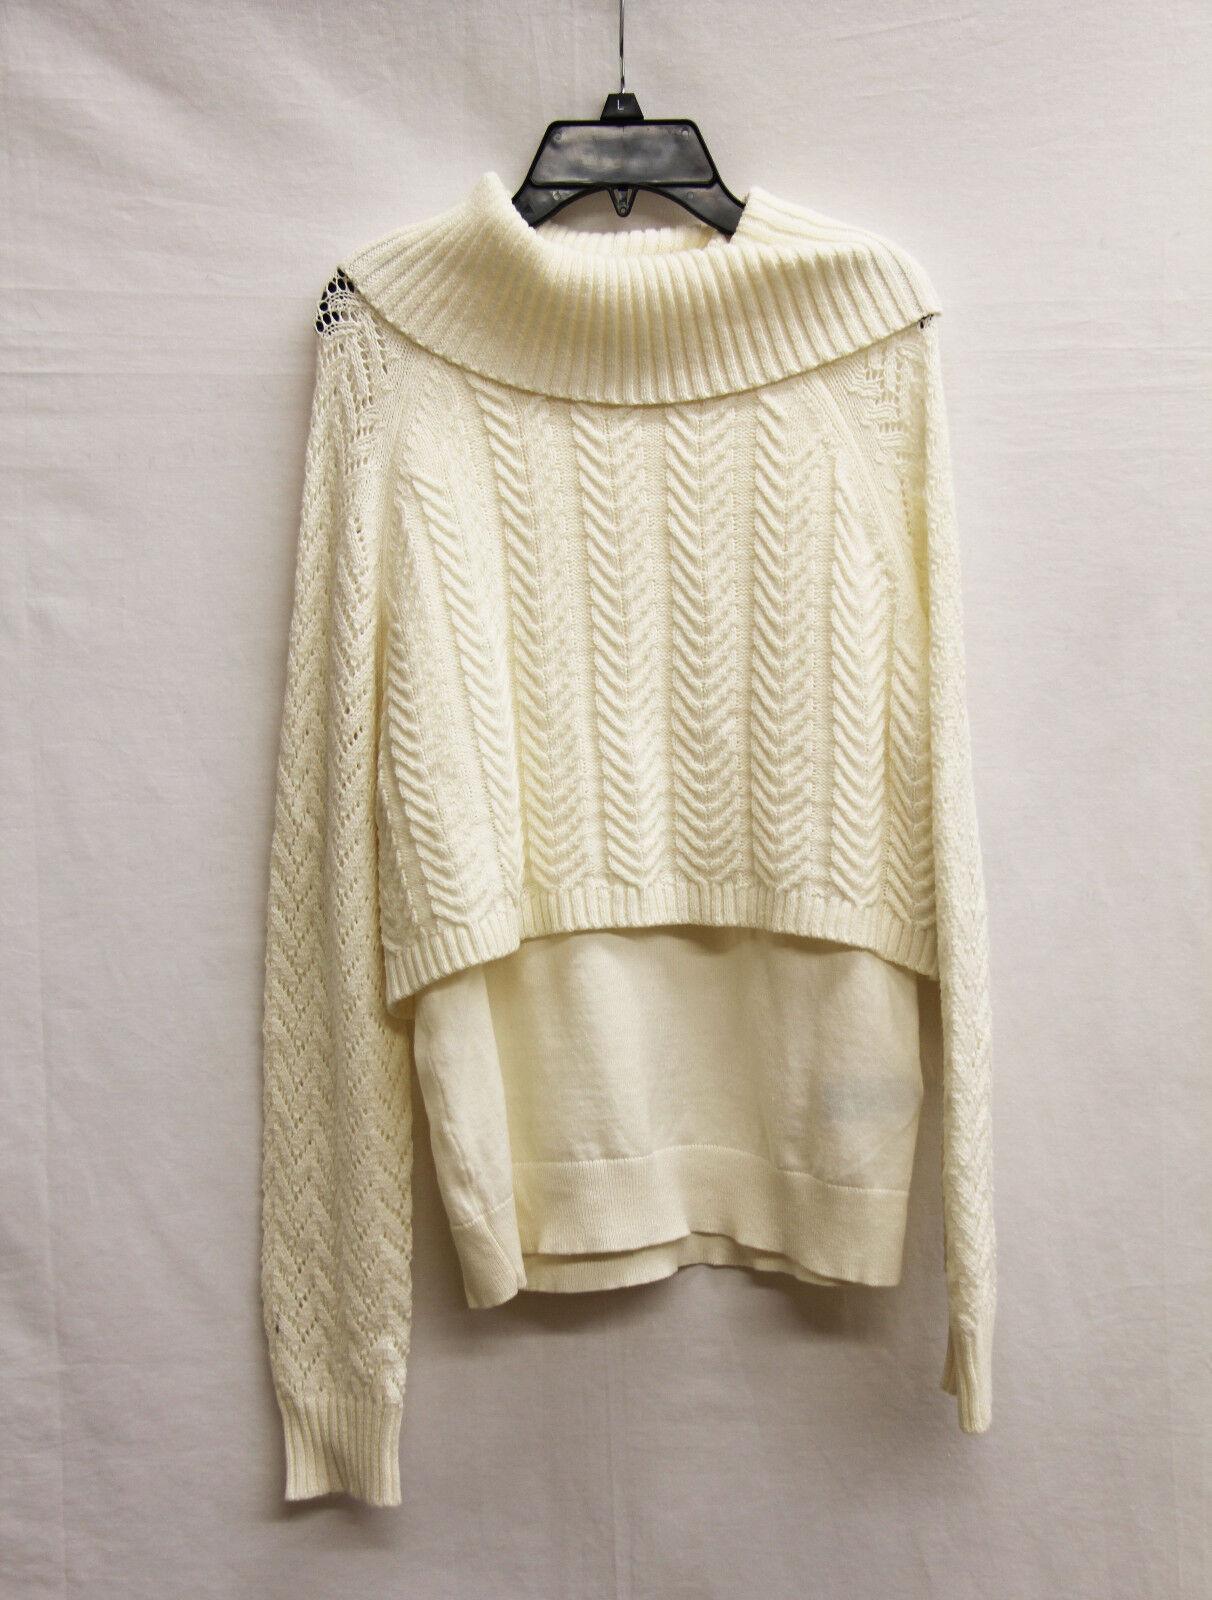 Vince Camuto Women's Sweater, M, Cream